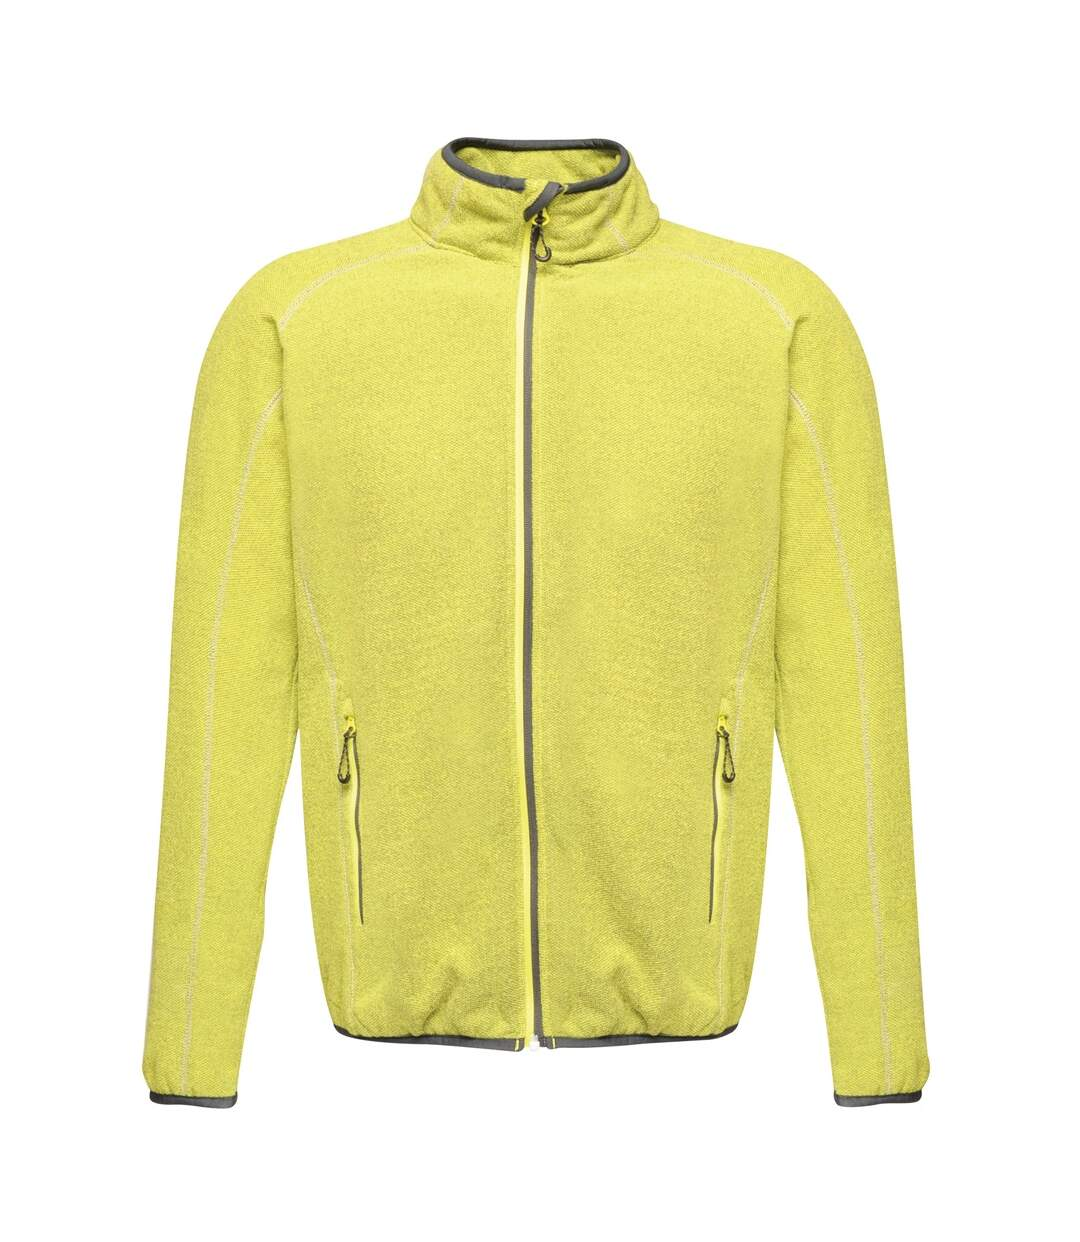 Regatta Mens Dreamstate Mini Honeycomb Fleece Jacket (Lime Punch) - UTPC3631